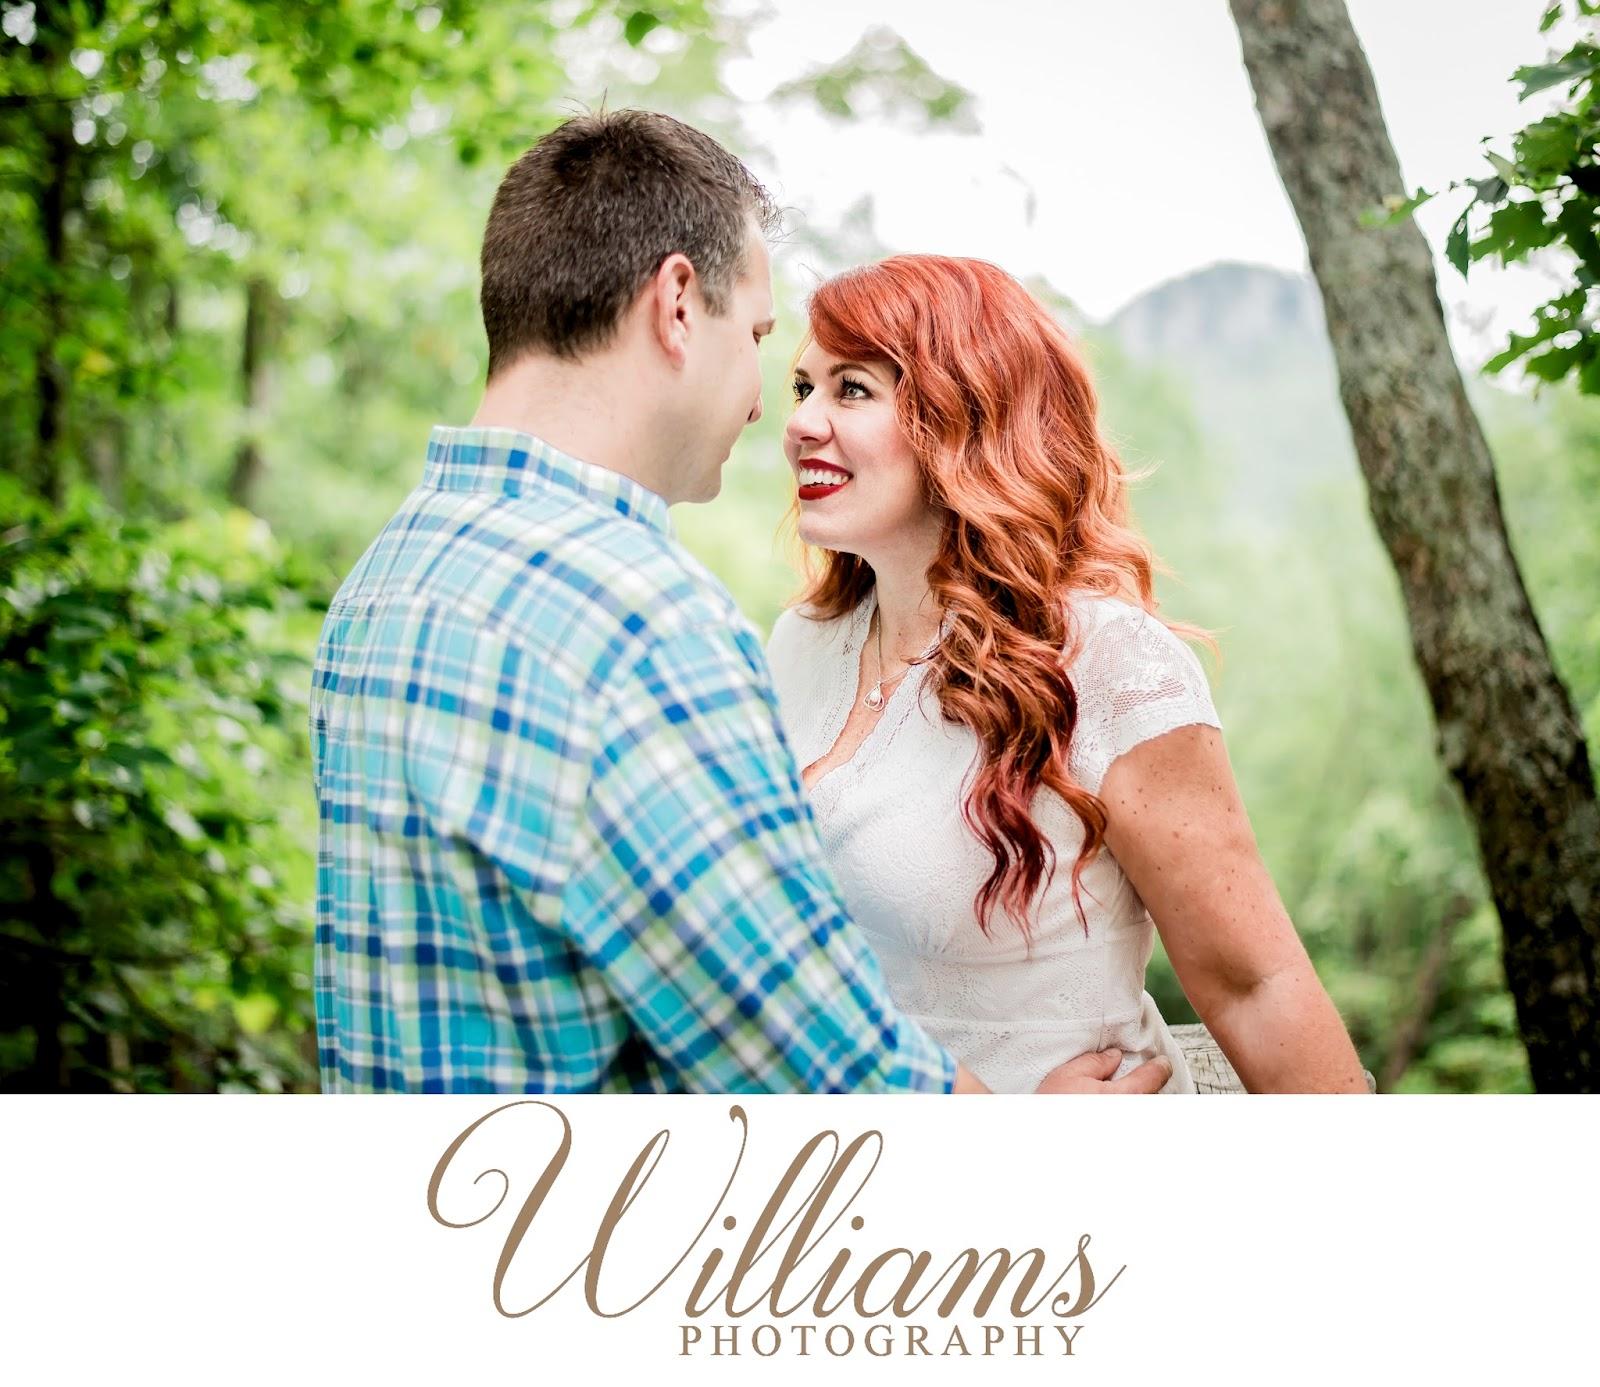 Althea williams fdating